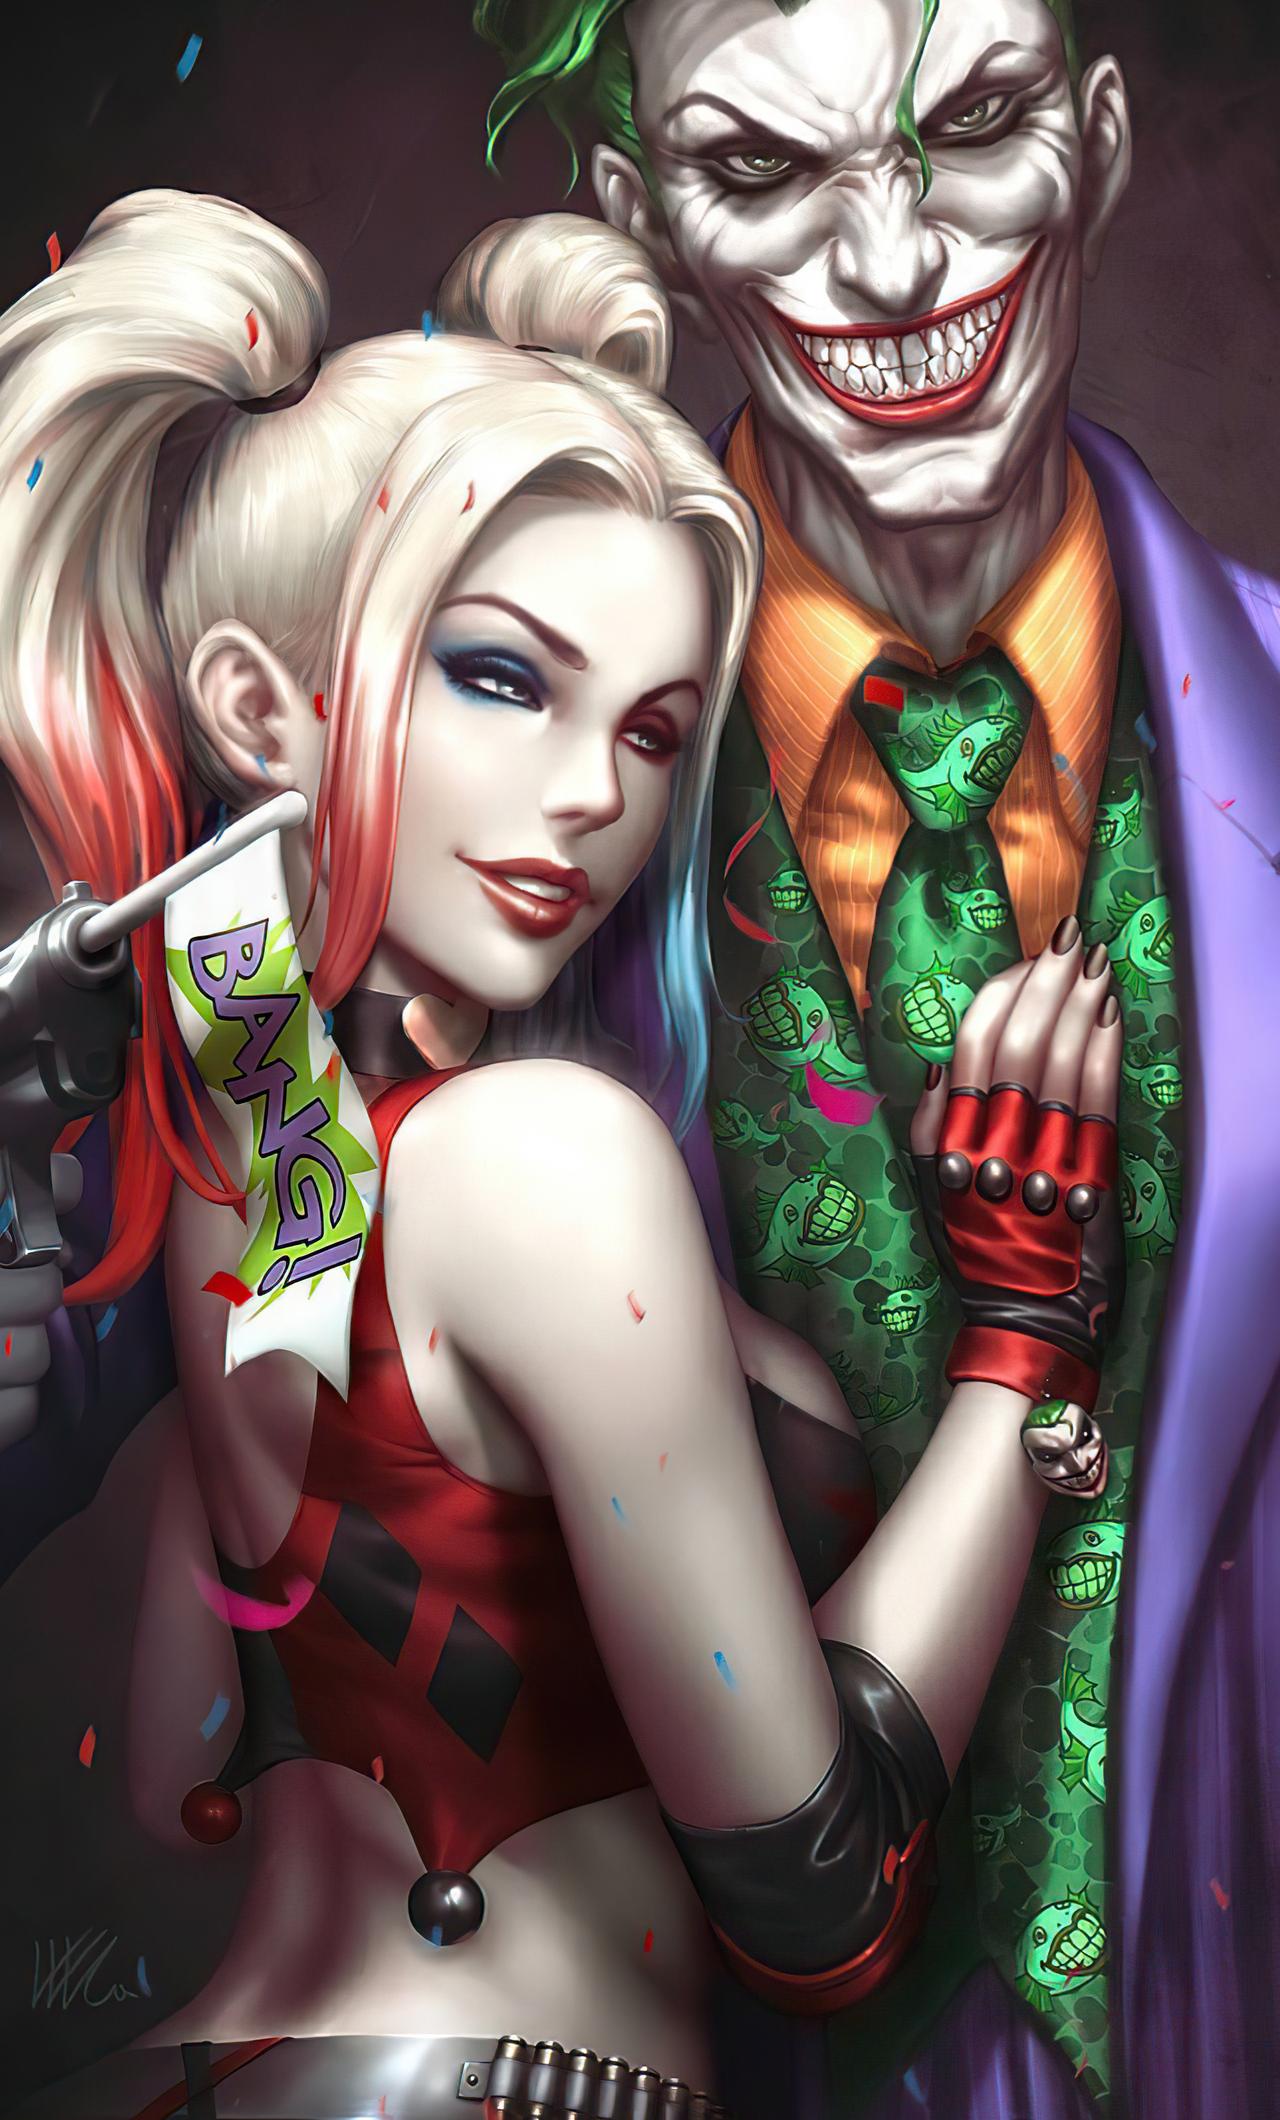 1280x2120 Joker And Harley Quinn Love 4k iPhone 6+ HD 4k ...